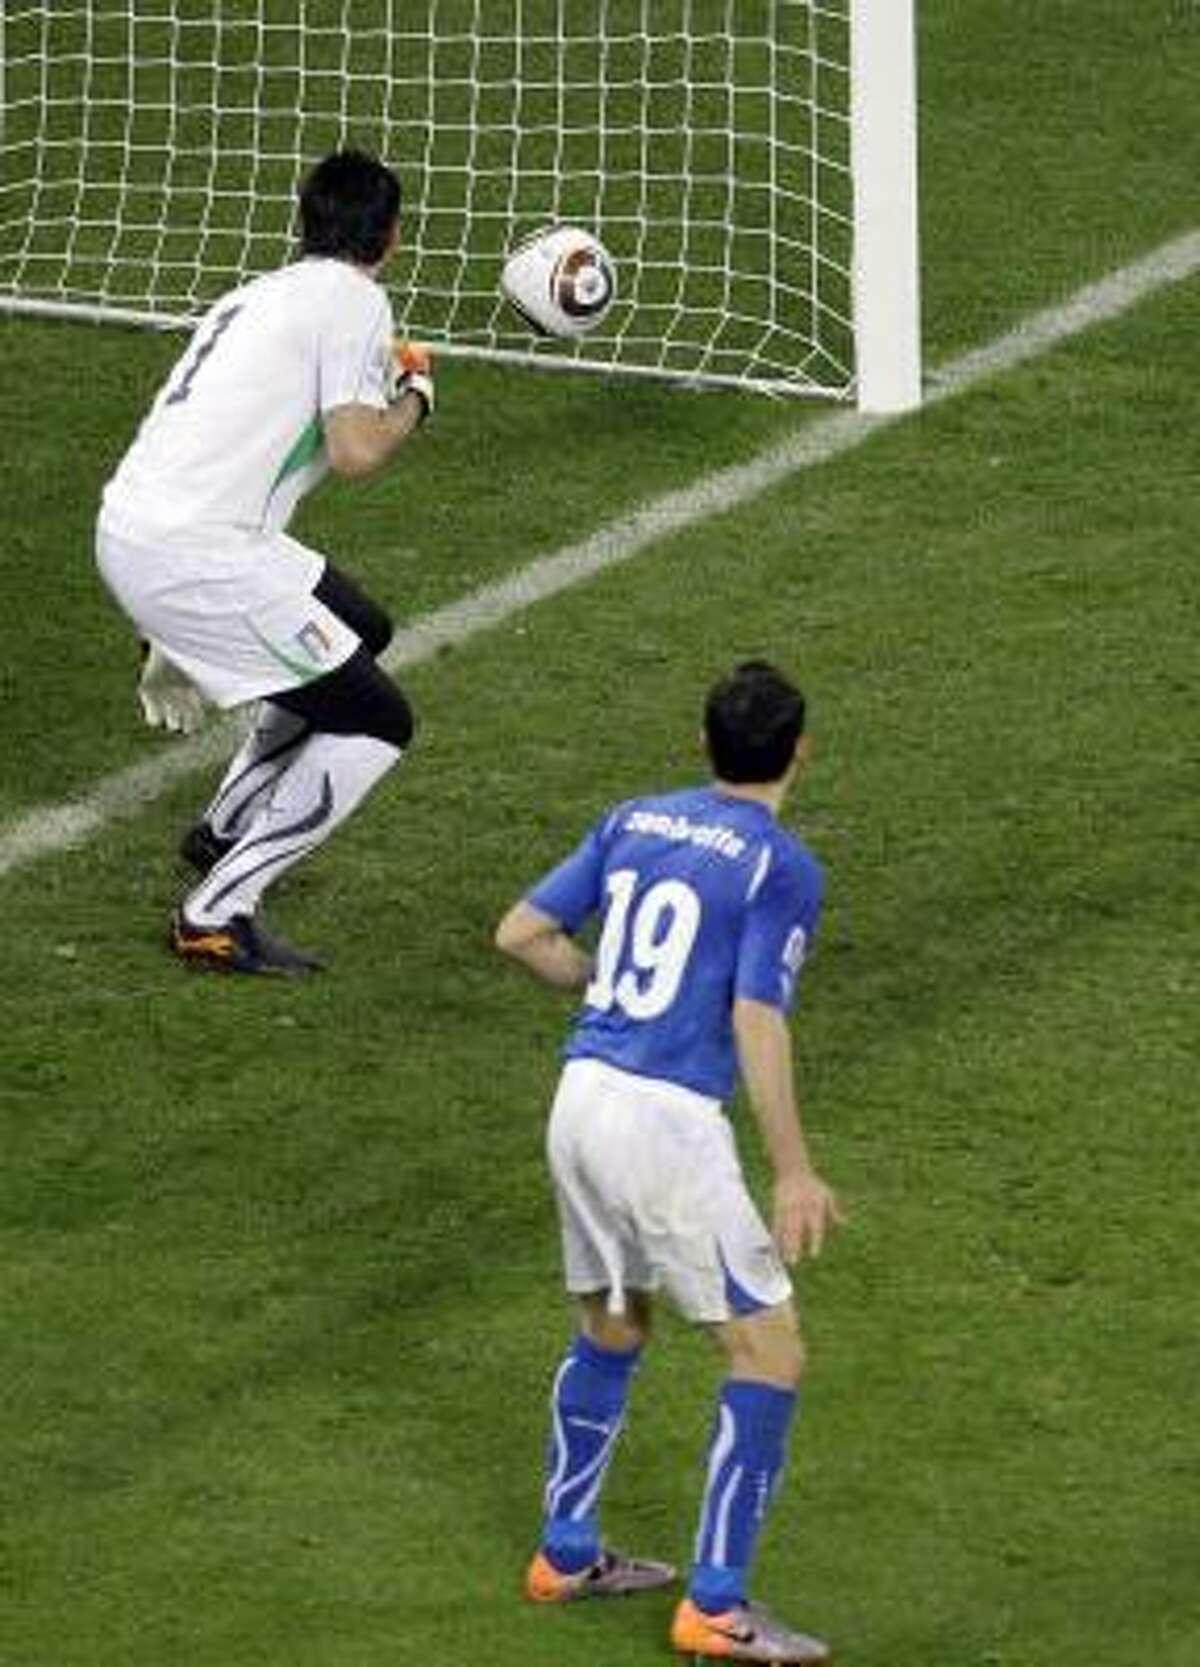 Italy defender Gianluca Zambrotta and goalkeeper Gianluigi Buffon can only watch as Antolin Alcaraz's header sails into the goal.